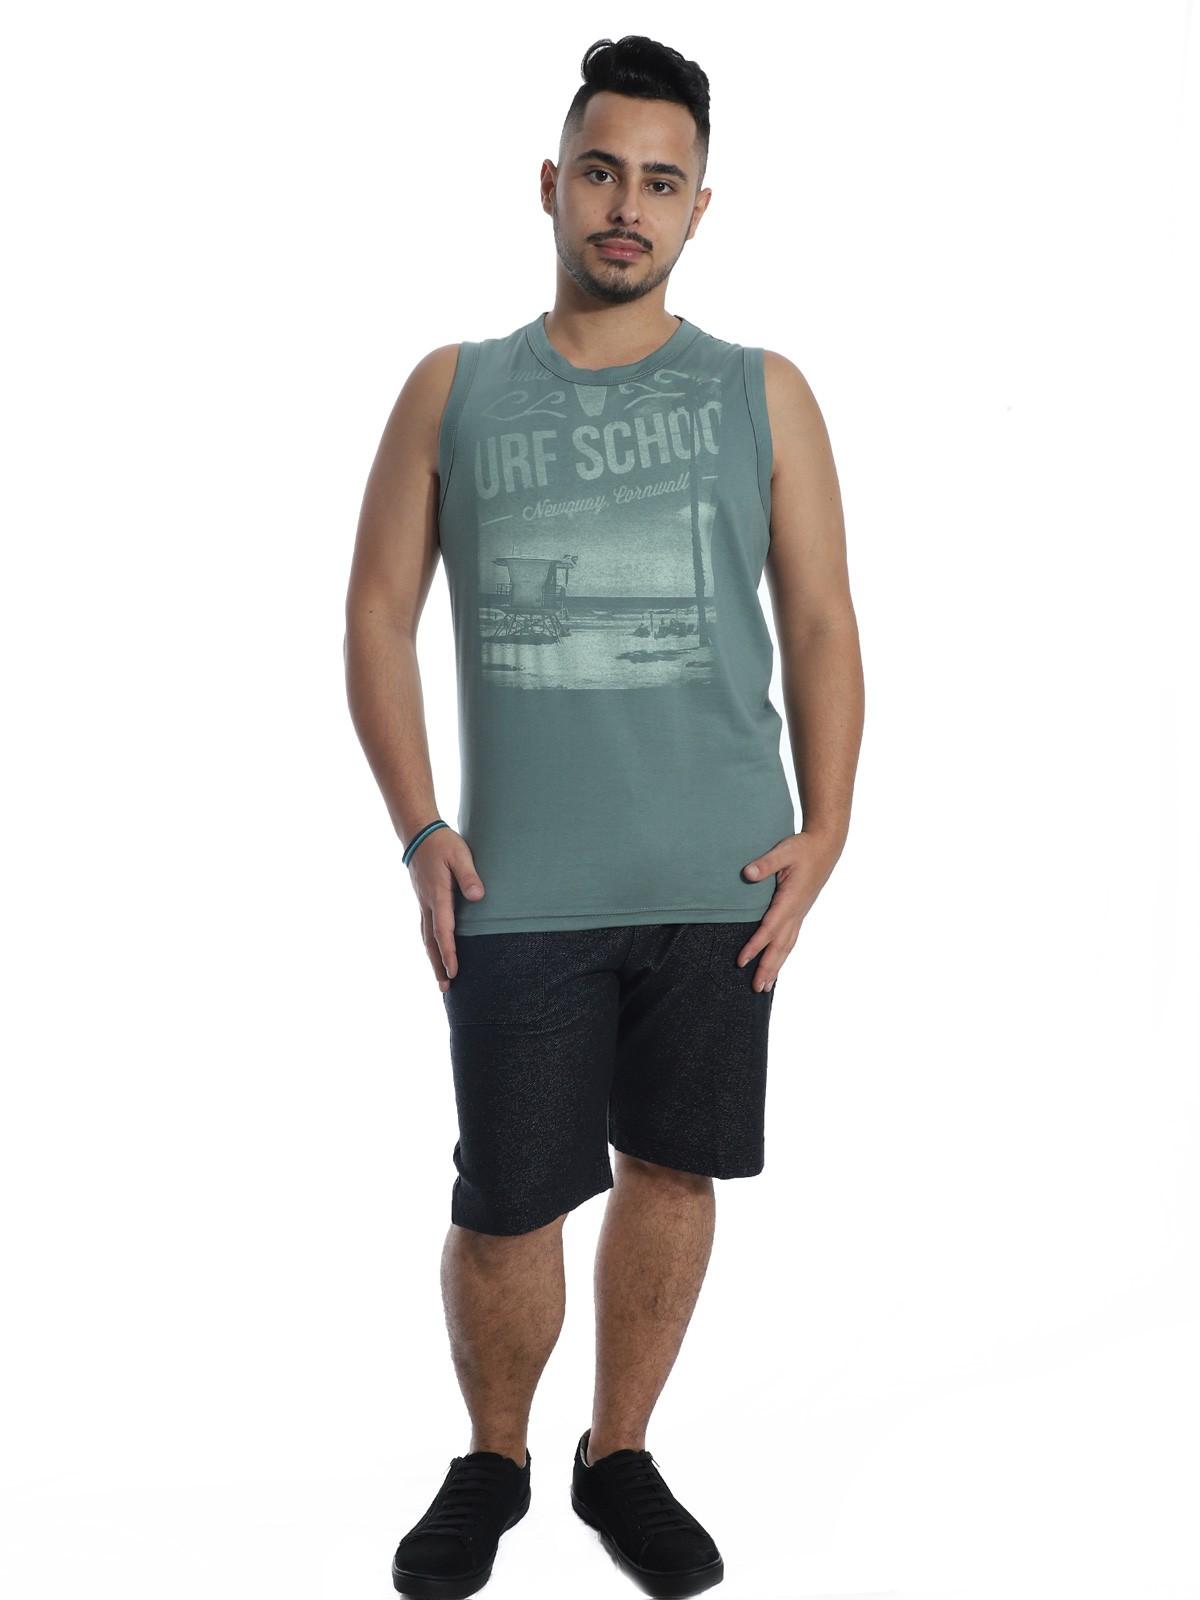 Regata Machão Masculino Anistia Surf School Concreto